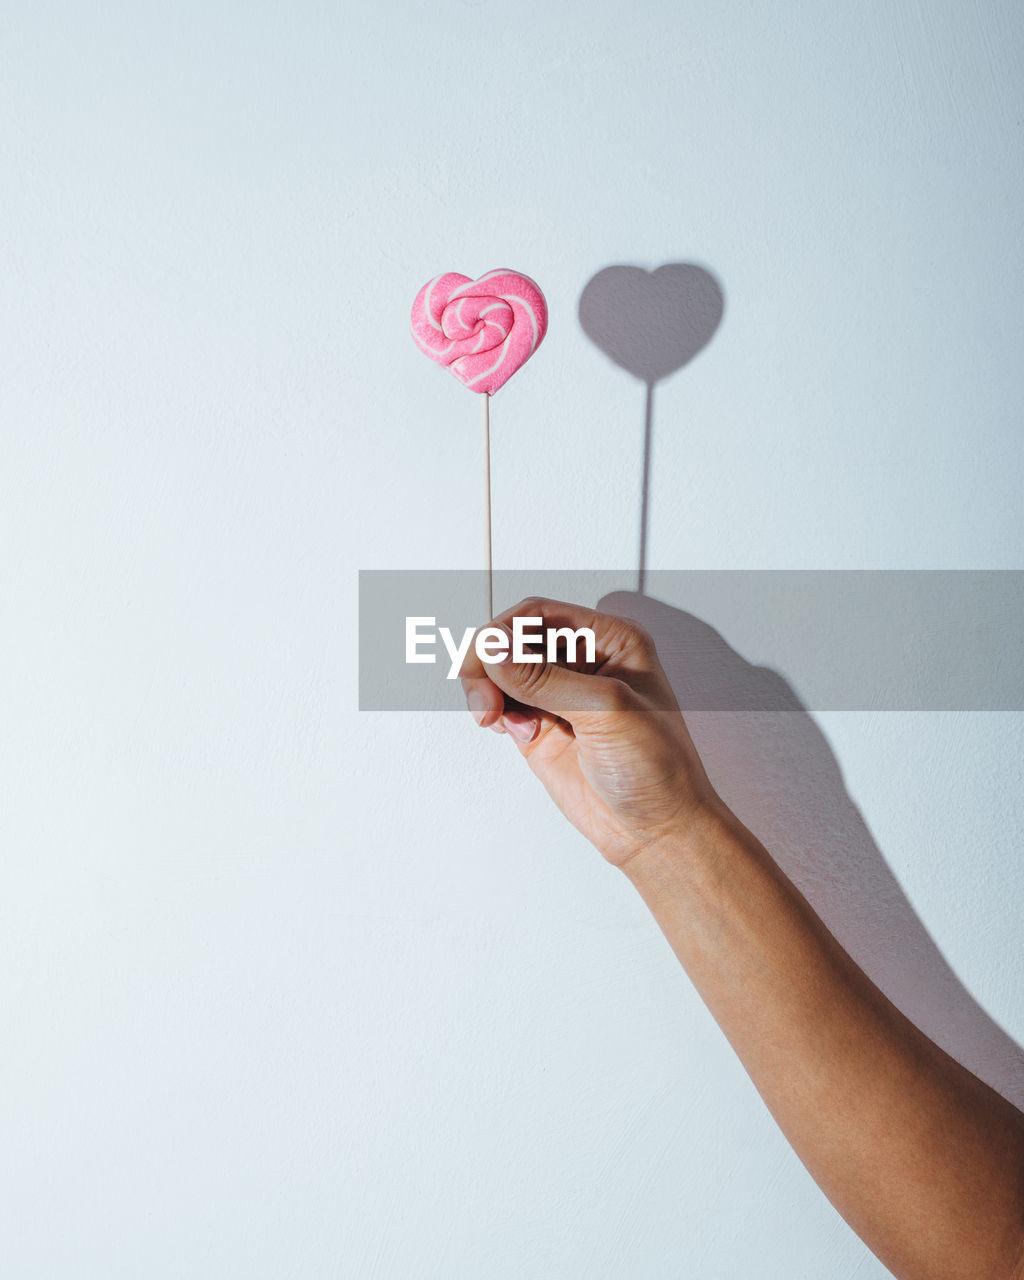 Woman hand holding lollipop